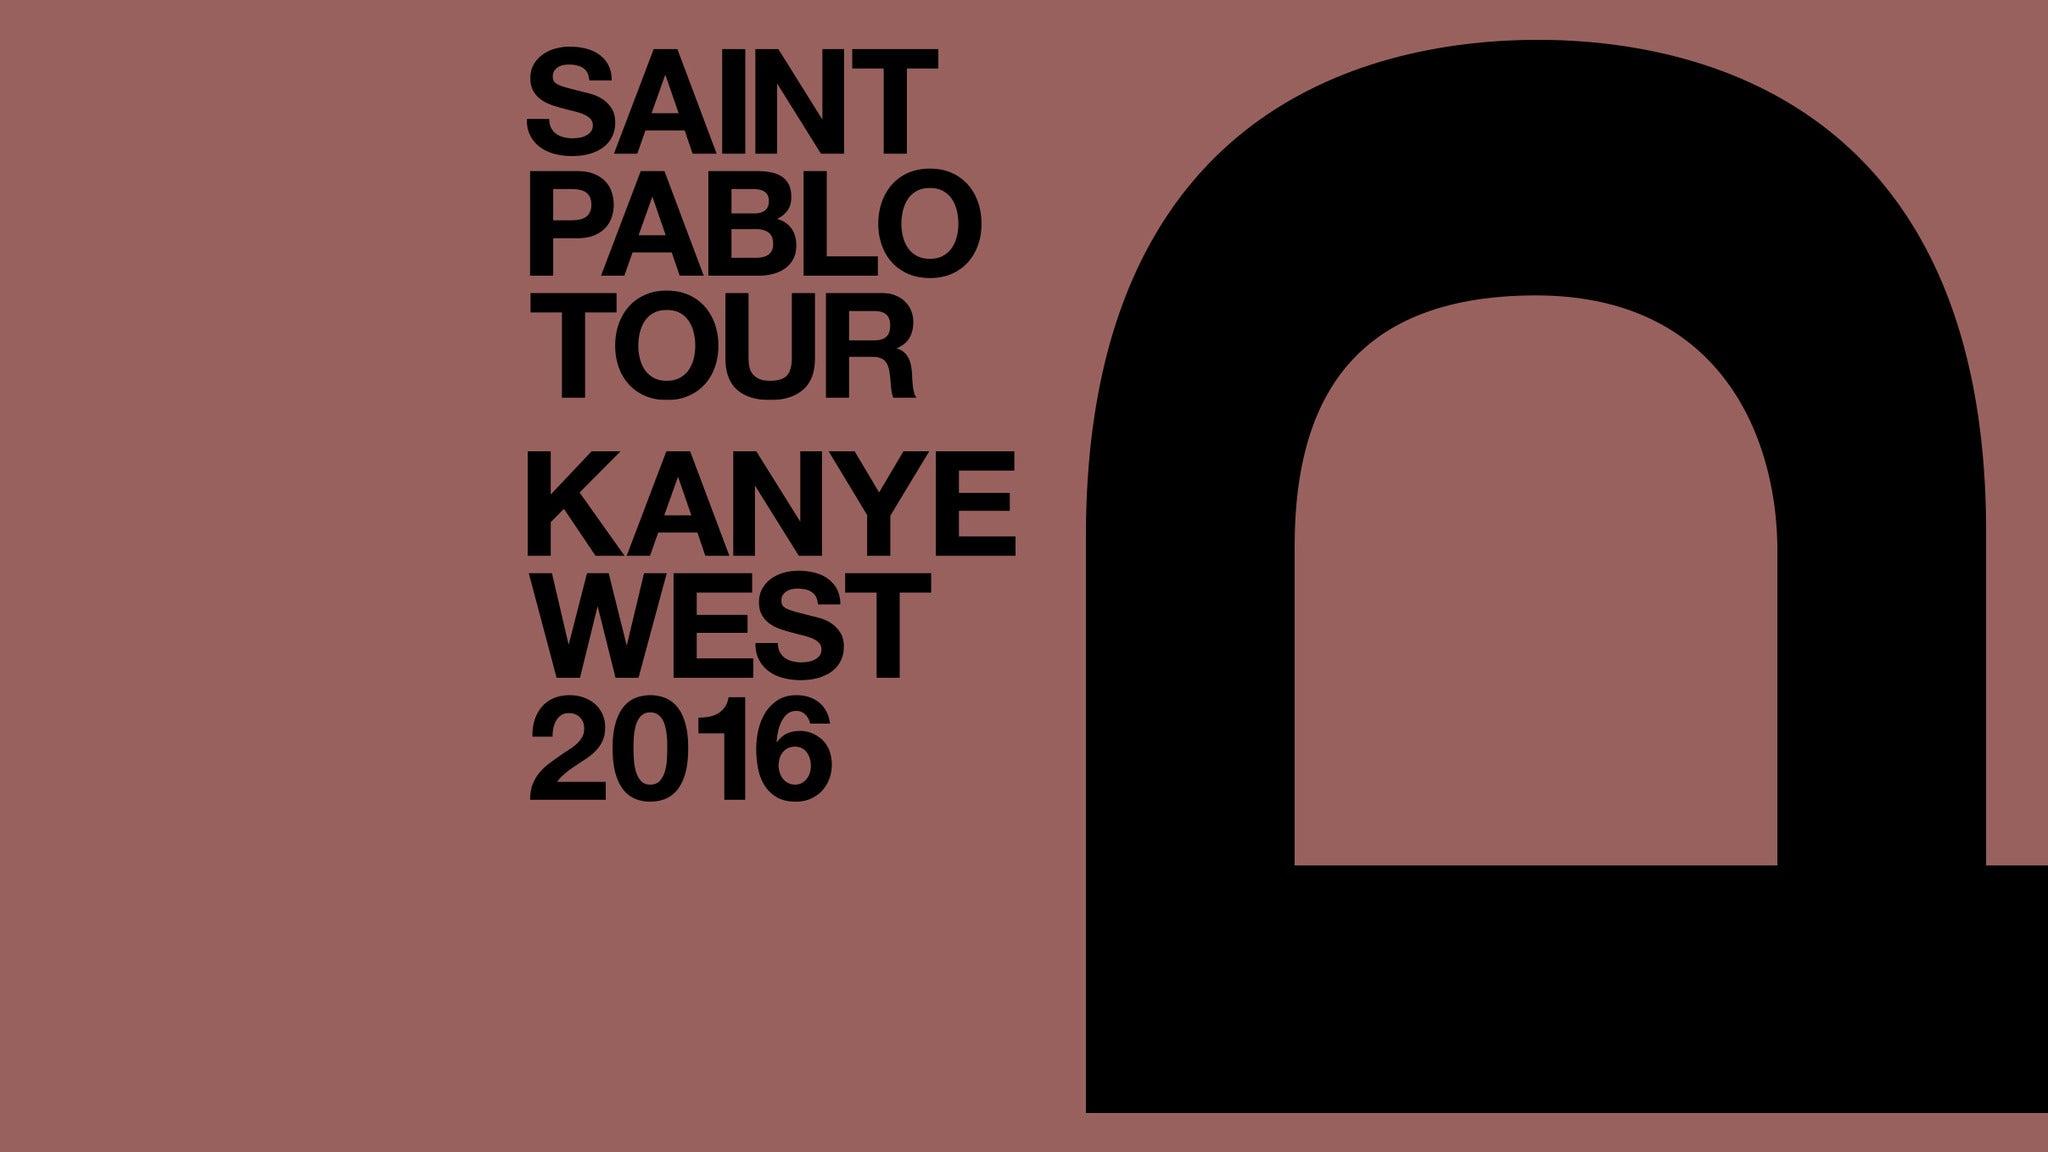 Kanye West: The Saint Pablo Tour at United Center